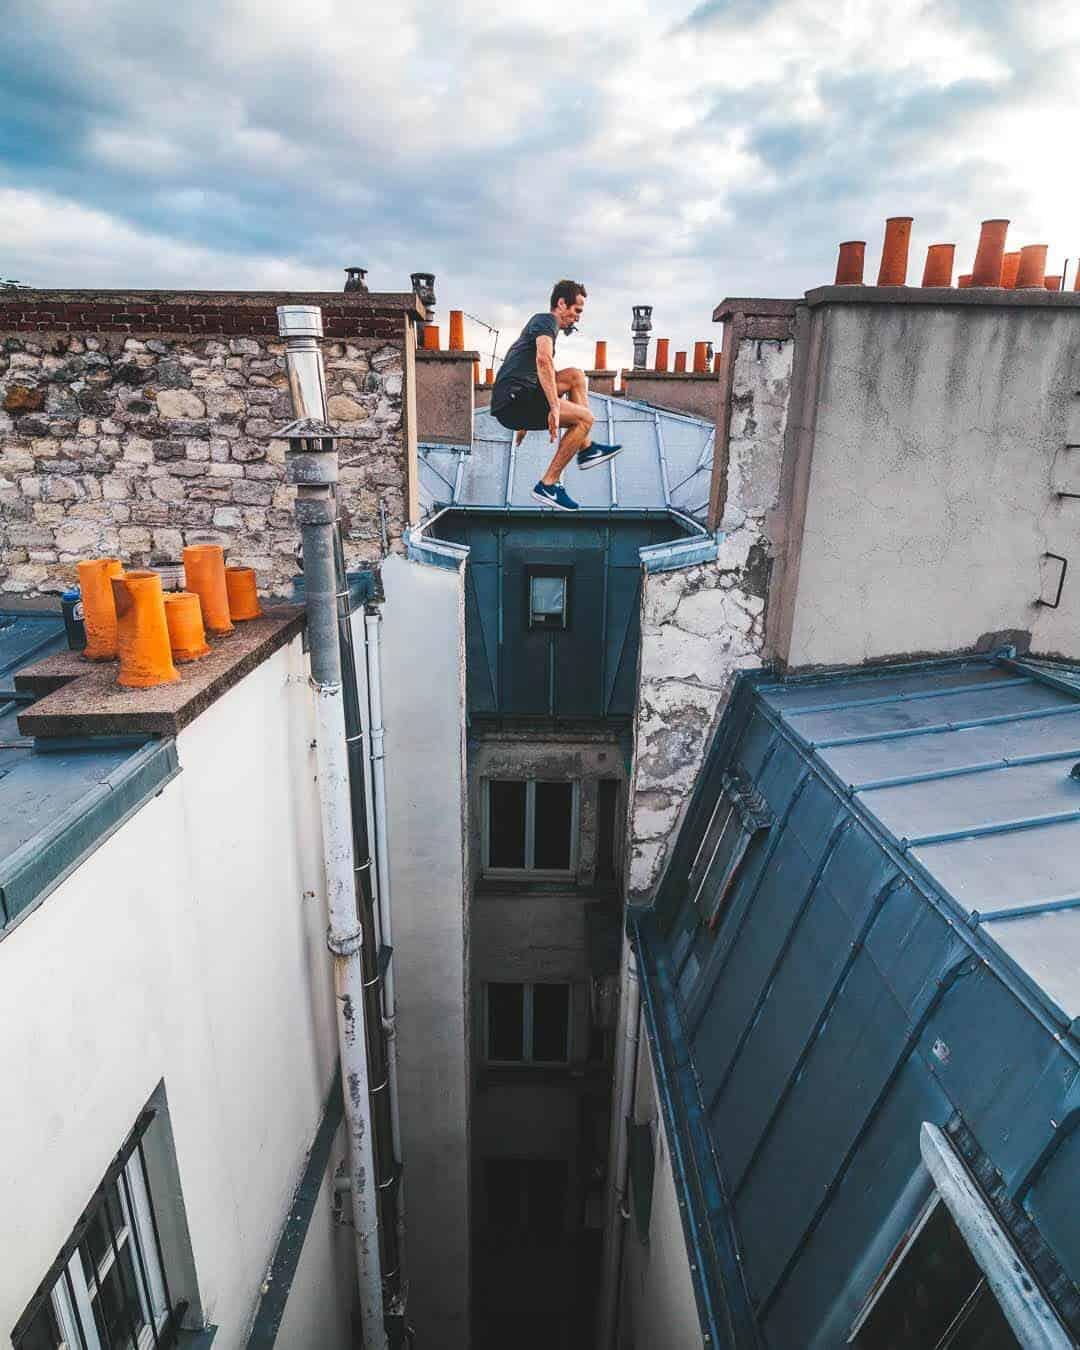 etrefort thibaut parkour clothing outdor paris rooftop pov gopro mouth